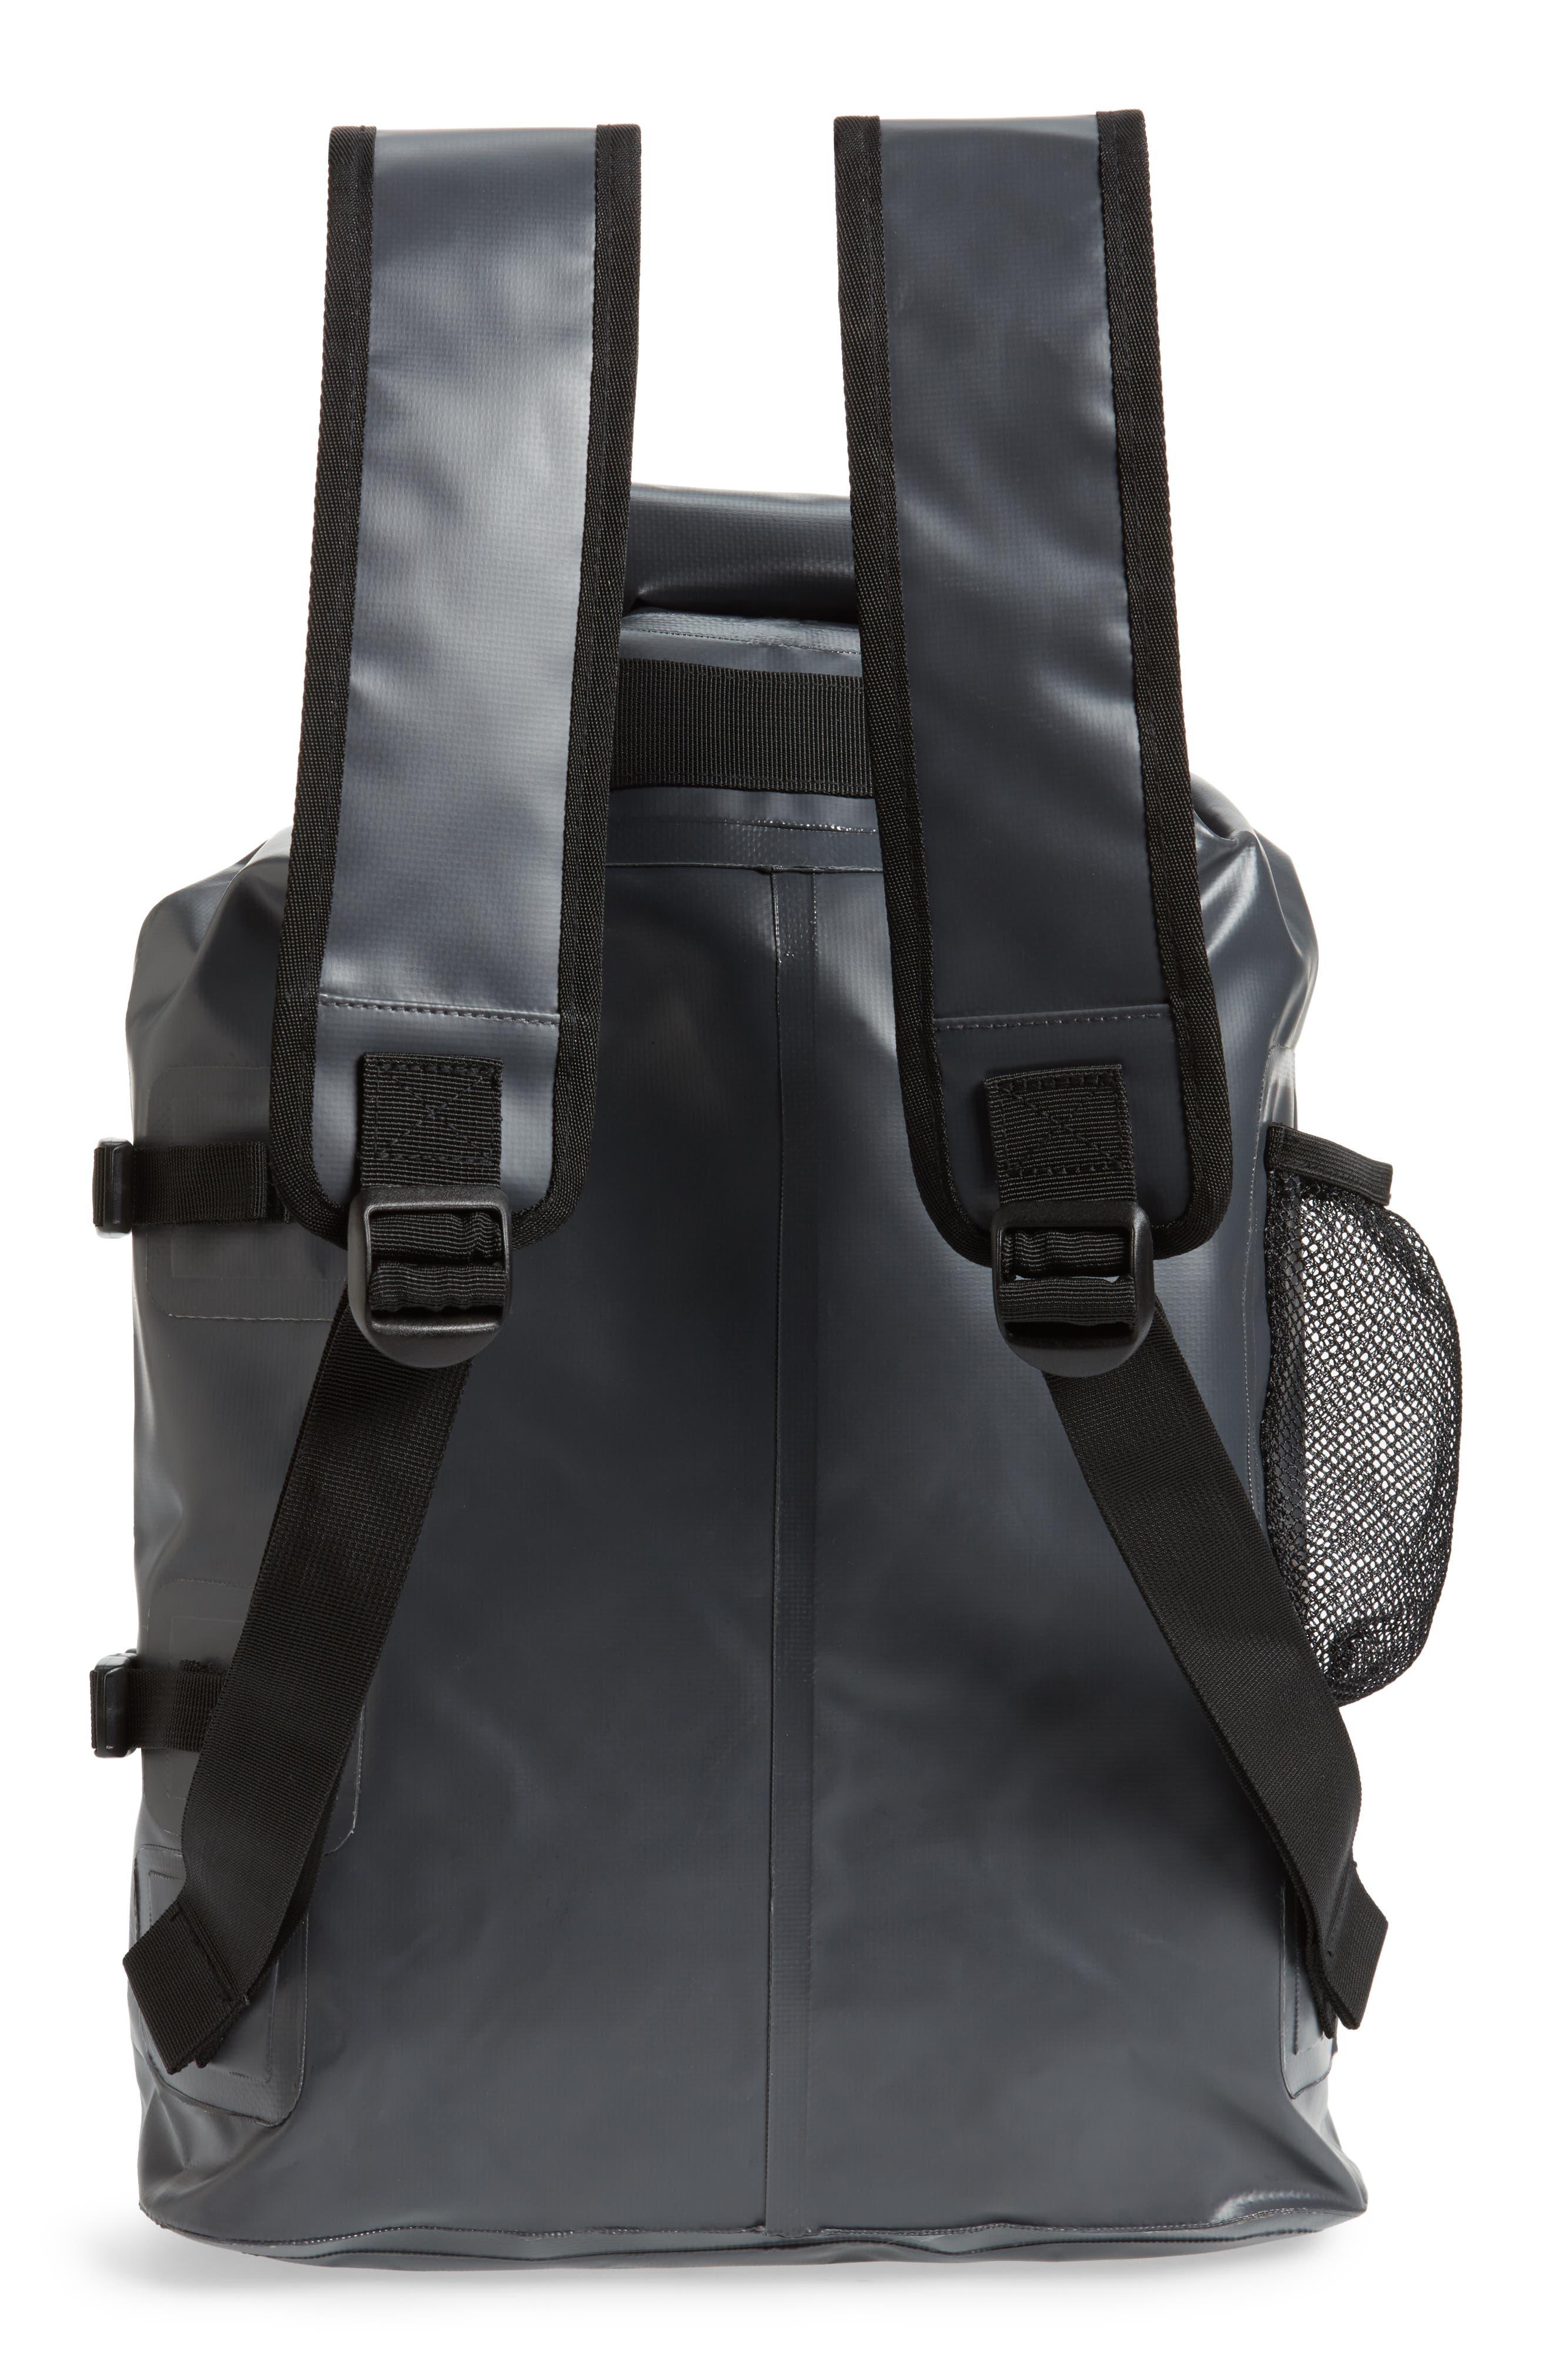 Go Be II Waterproof Backpack,                             Alternate thumbnail 3, color,                             Charcoal